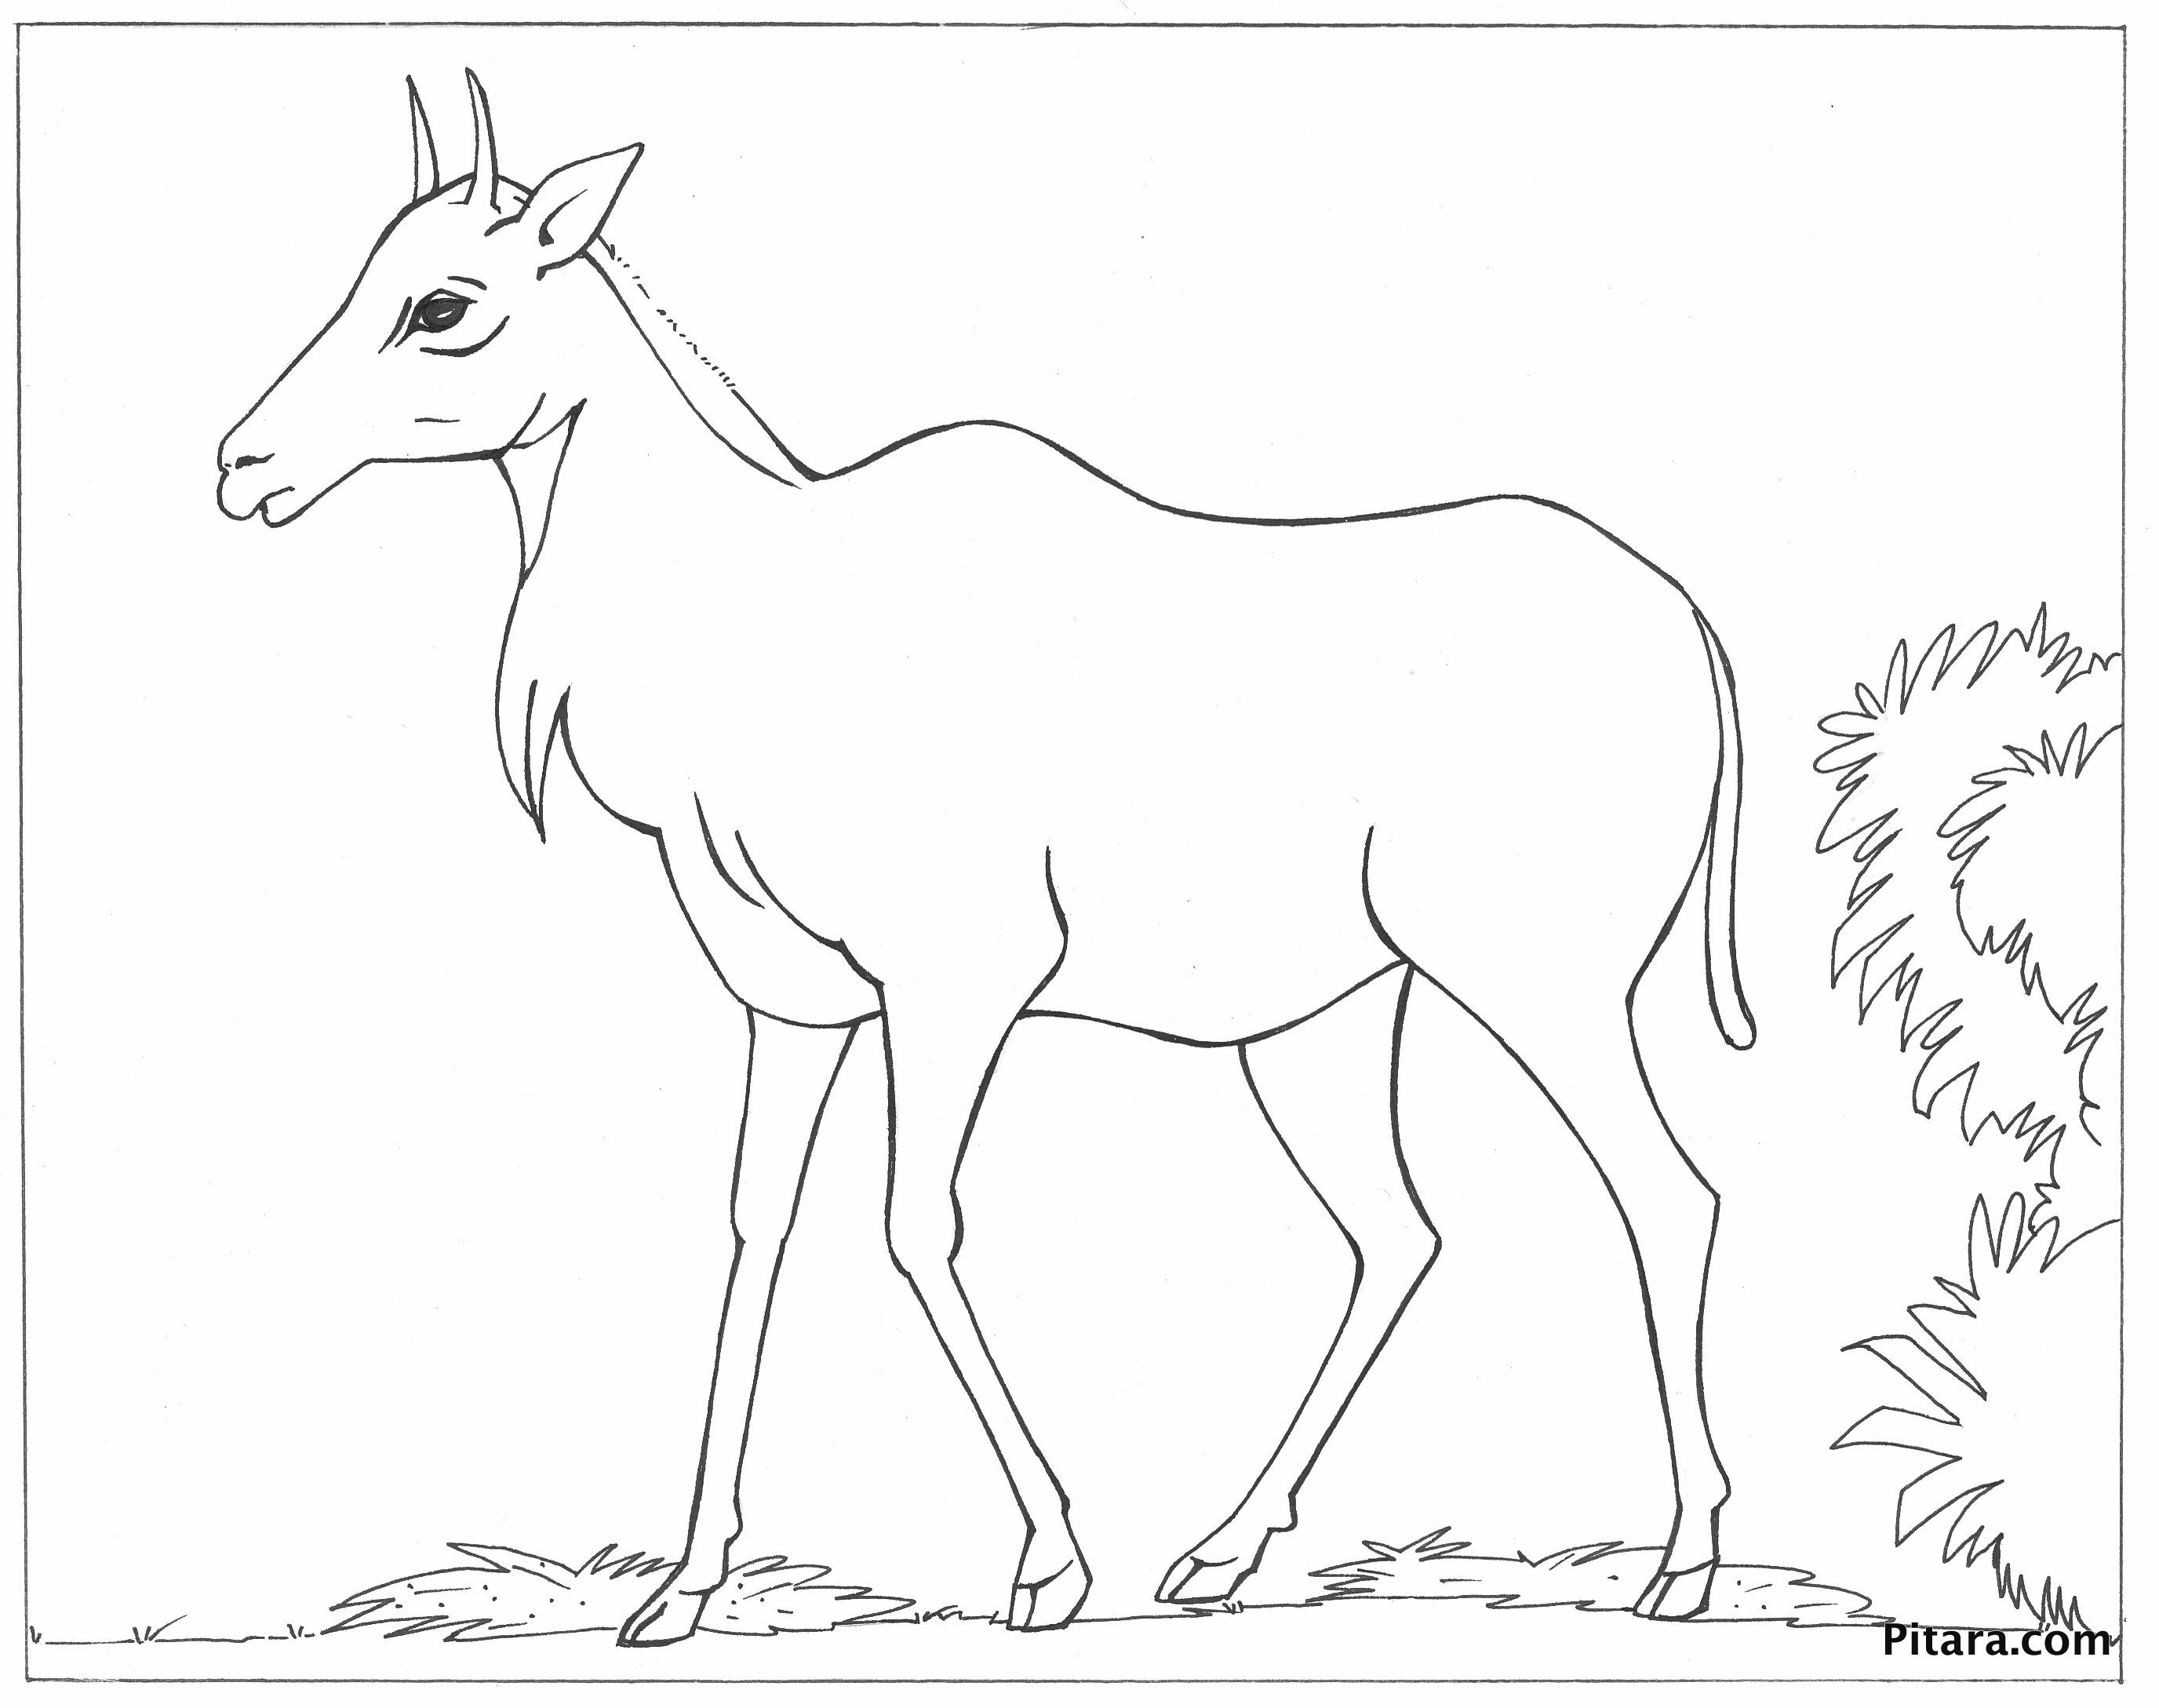 Nilgai (Asian antelope) – Coloring page